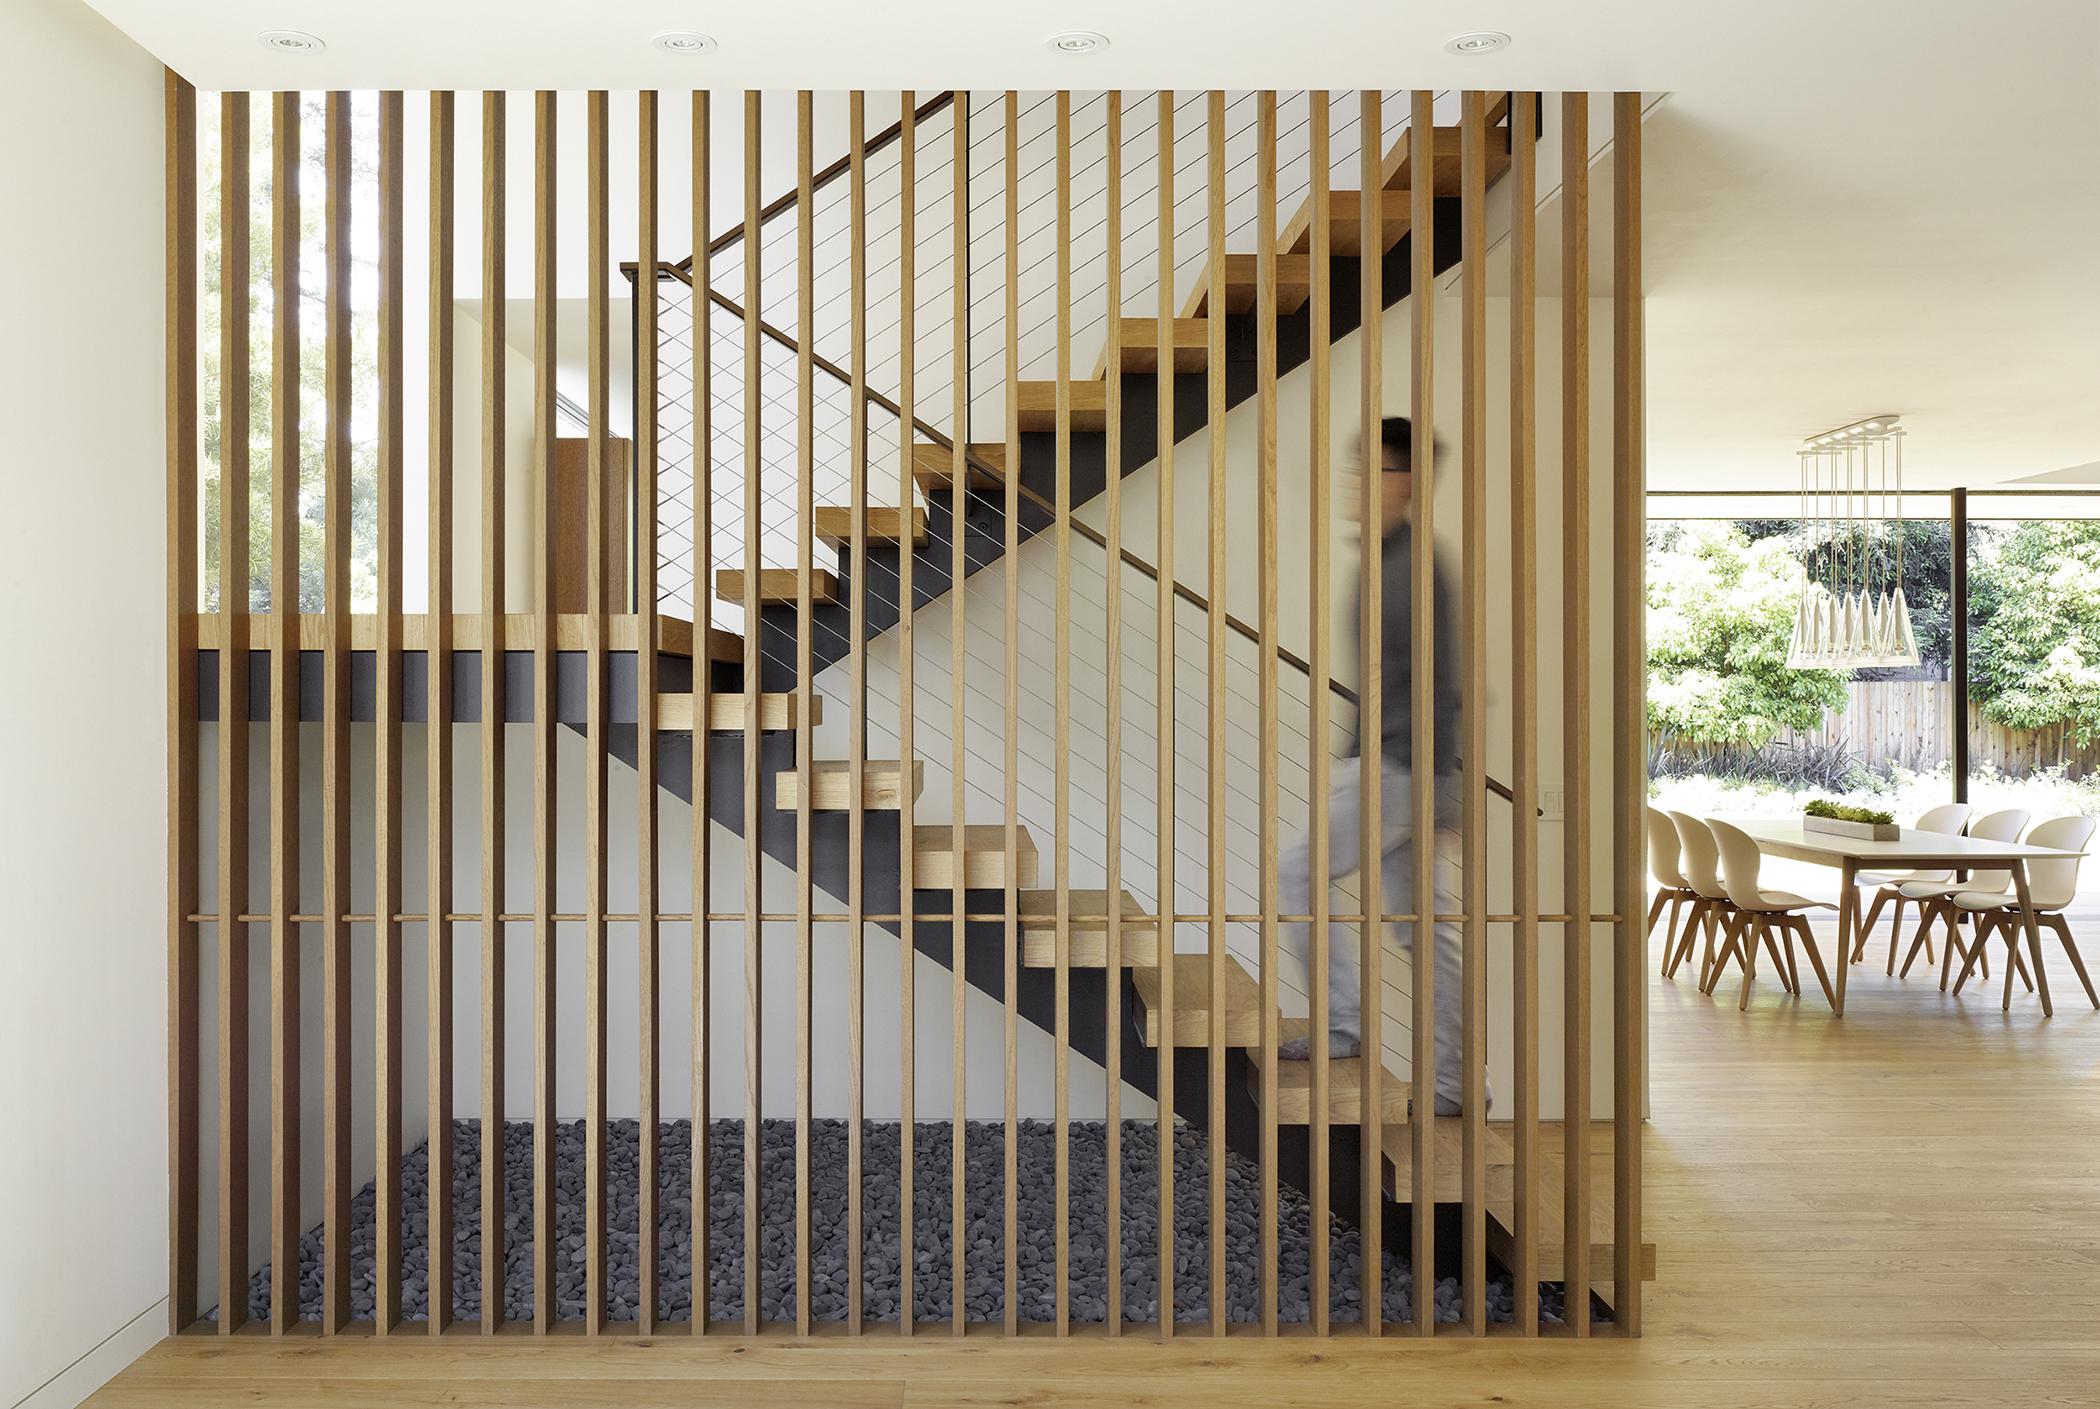 home design picture. Custom Home 2017 Builder s Choice  Design Awards Deadlines Extended Enter the